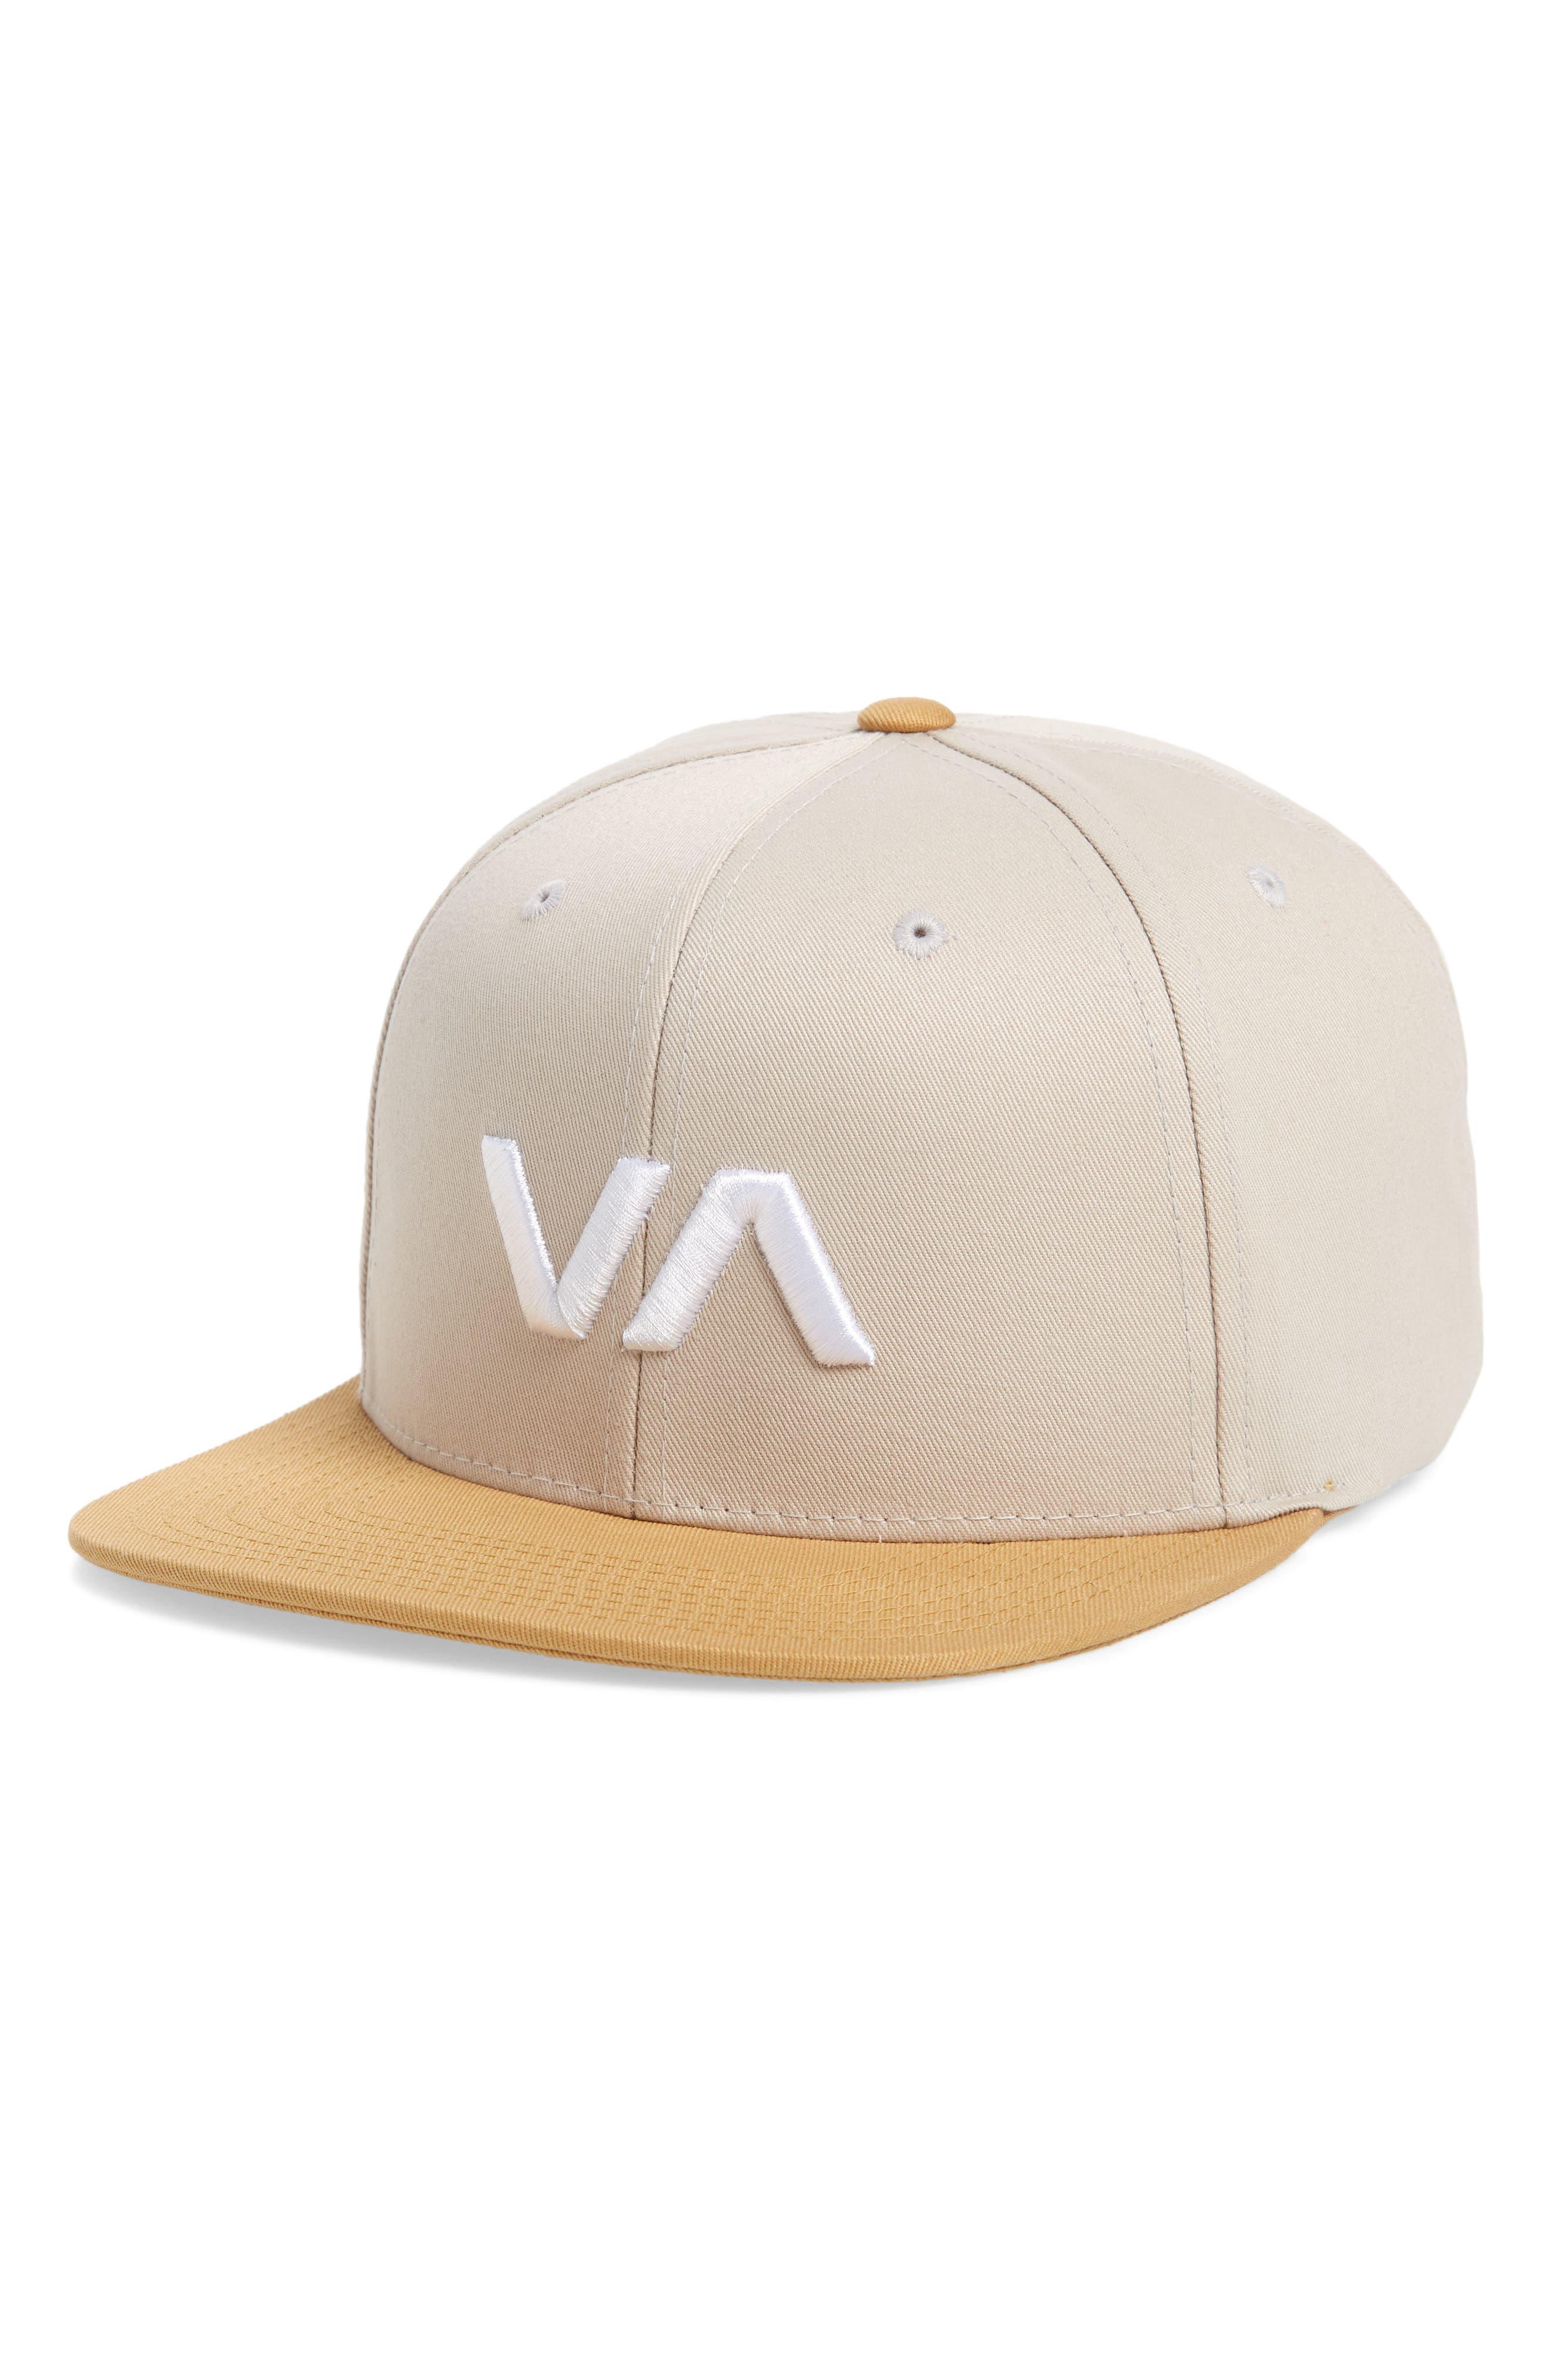 'VA' Snapback Hat, Main, color, GREY GHOST